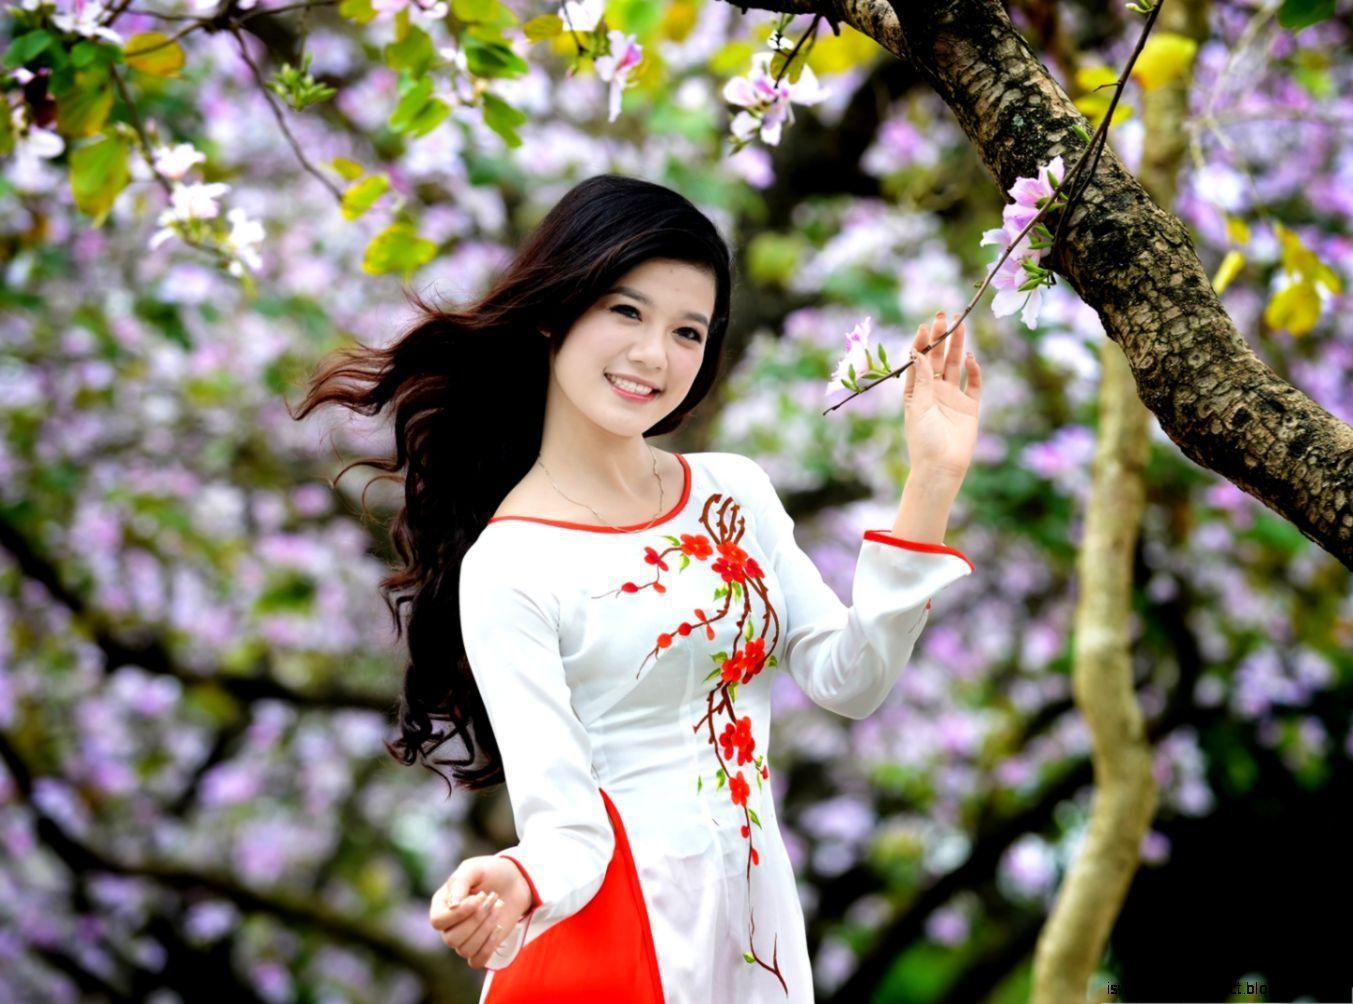 Woman Beautiful Nature Wallpapers Top Free Woman Beautiful Nature Backgrounds Wallpaperaccess